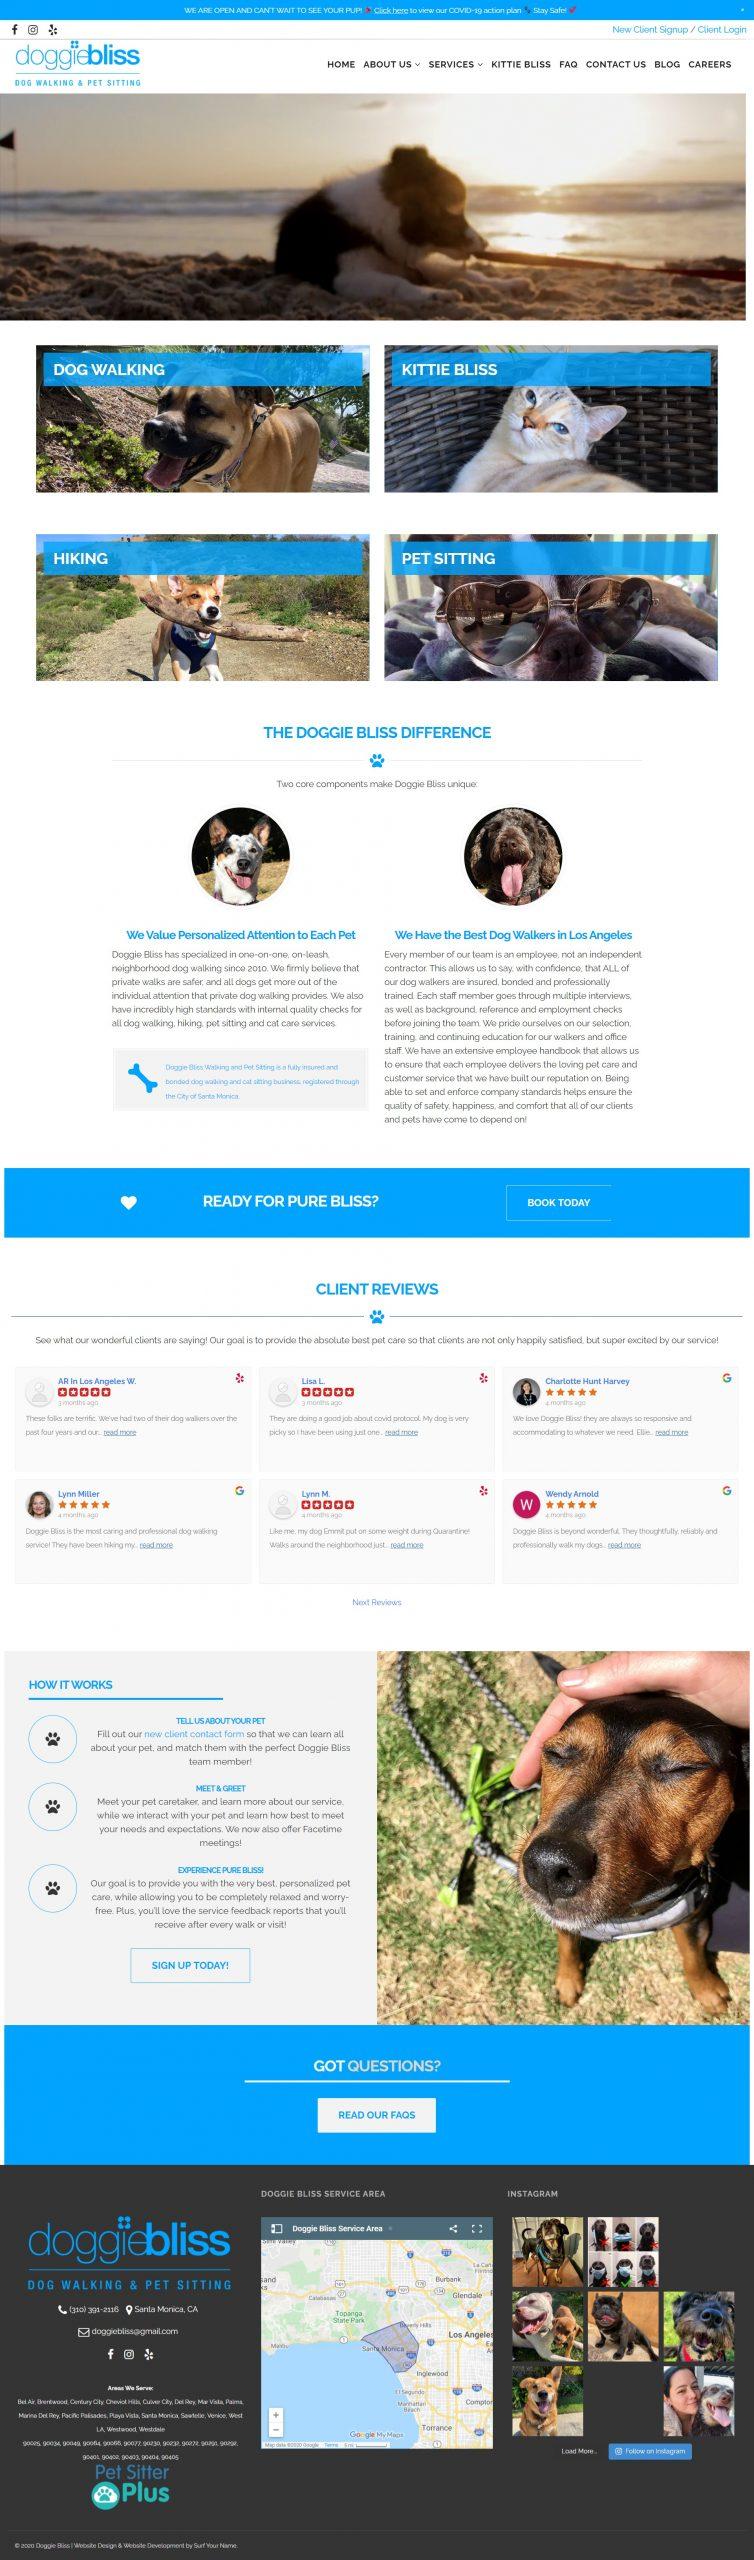 Doggie Bliss - Custom WordPress Website - Norfolk Web Design - Virginia Web Development